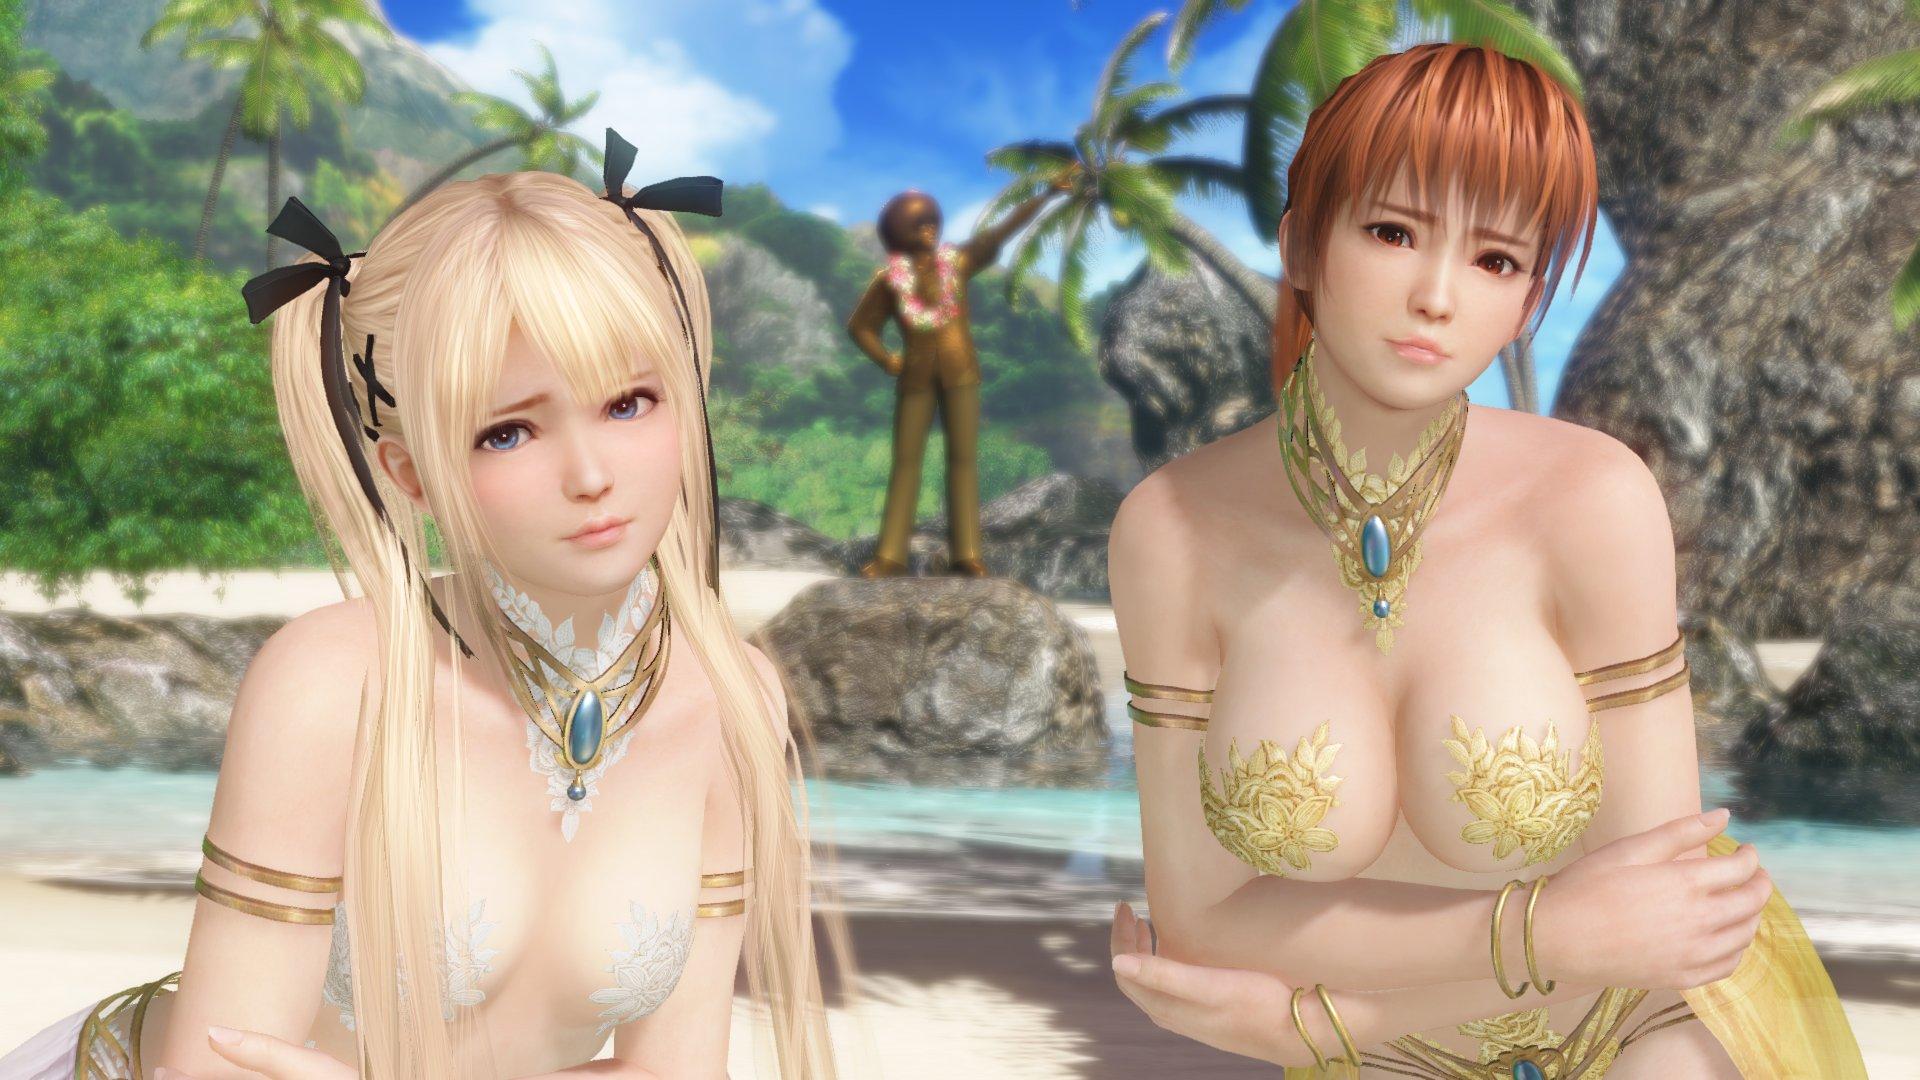 Dead Or Alive Xtreme Venus Vacation Steam Update Brings